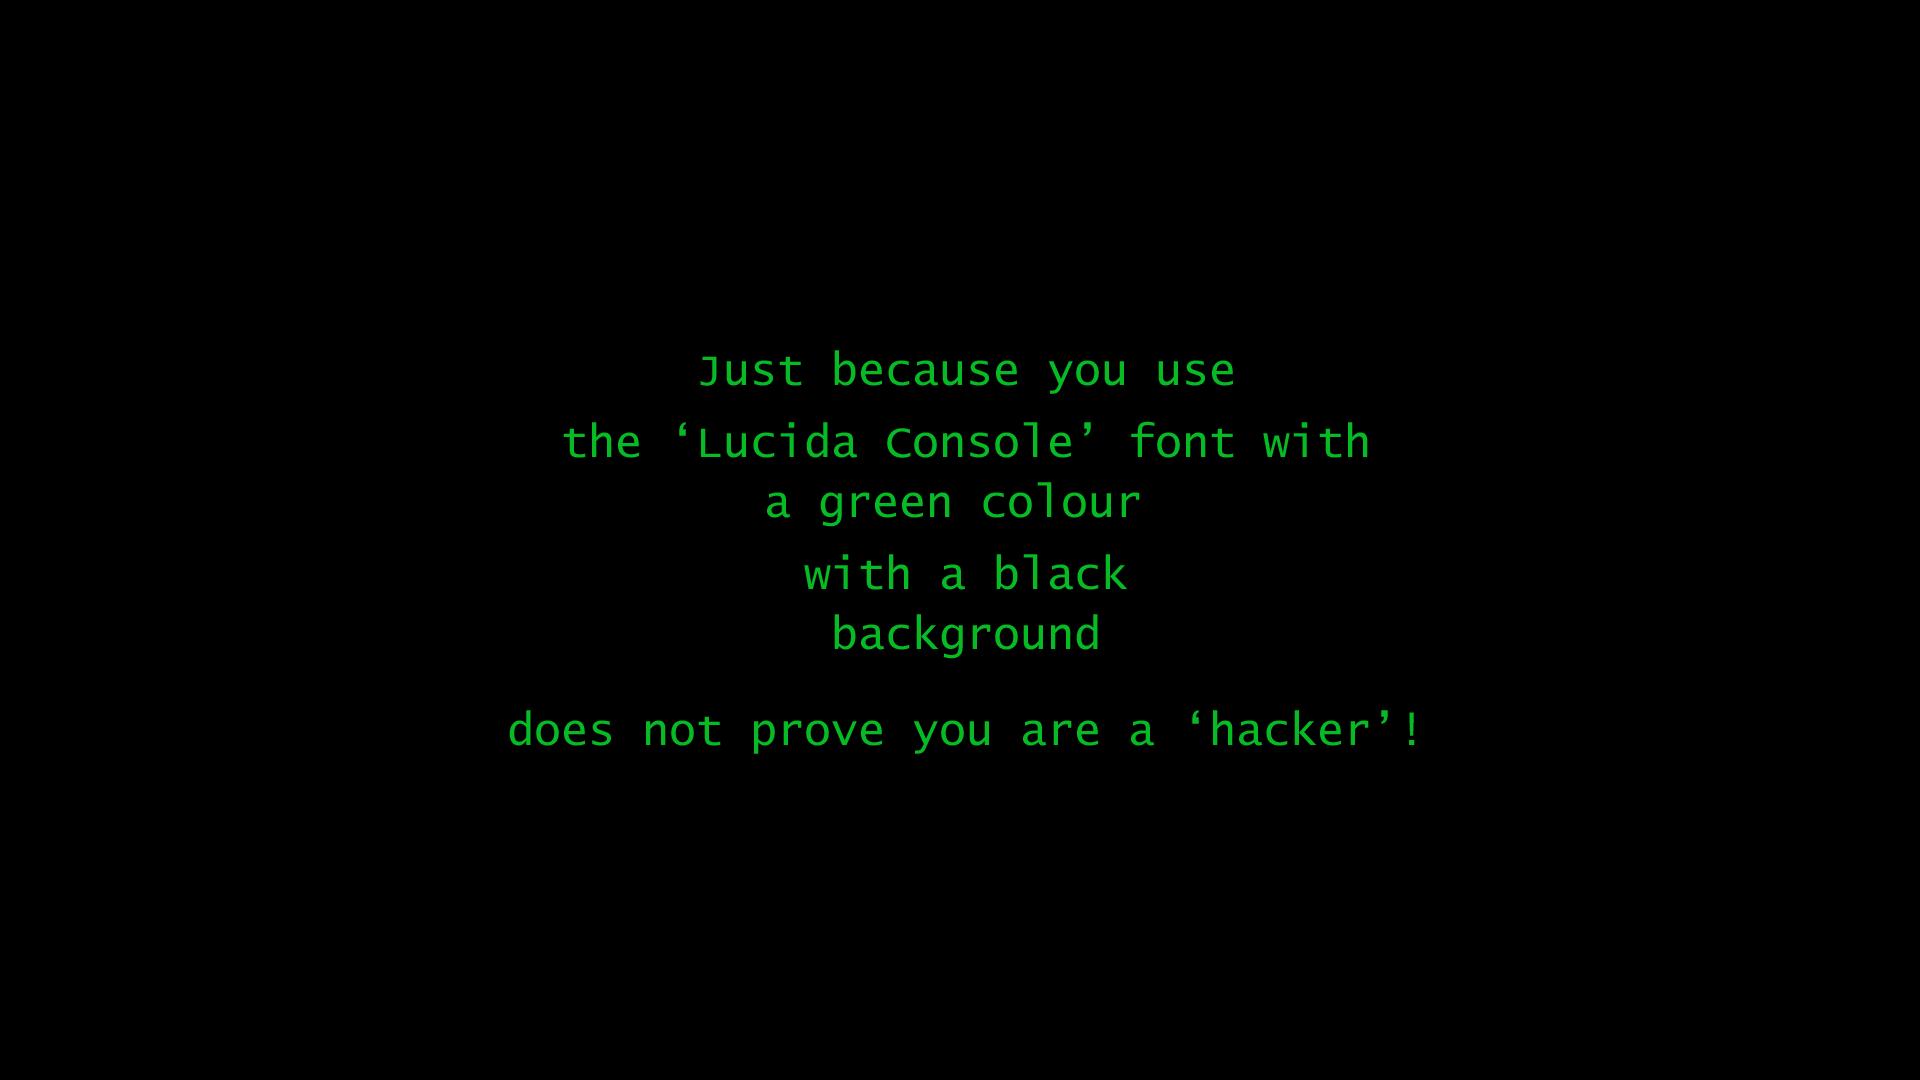 Hacker Black Green computer wallpaper background 1920x1080